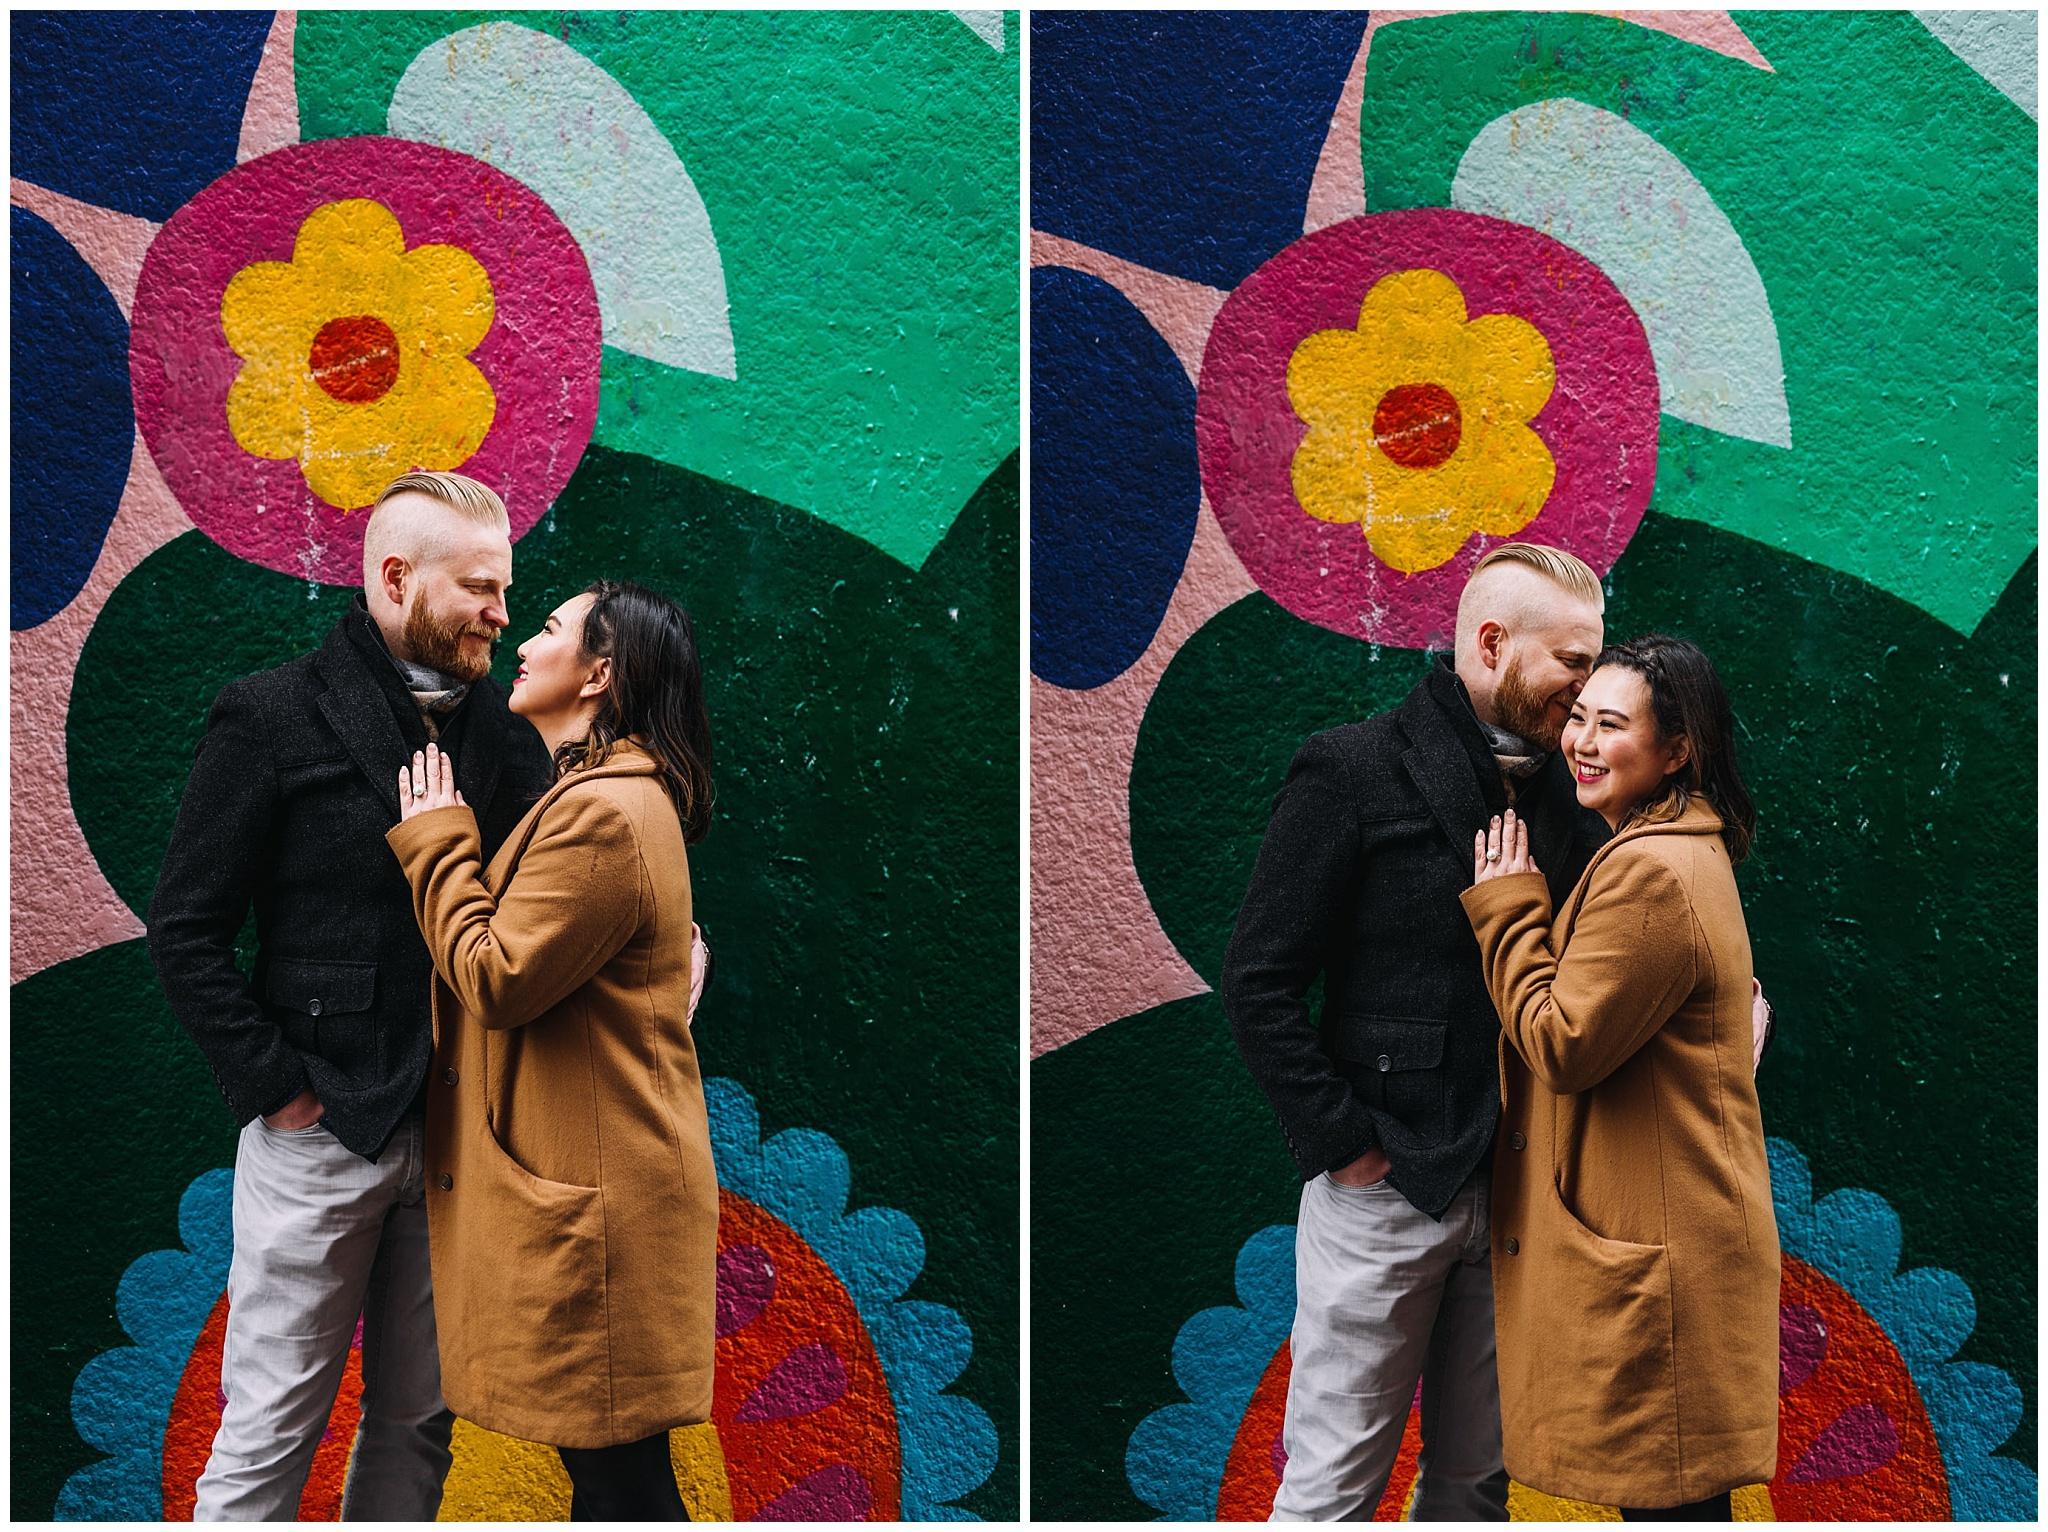 vancouver mural festival engagement photos couple sandeep johal art